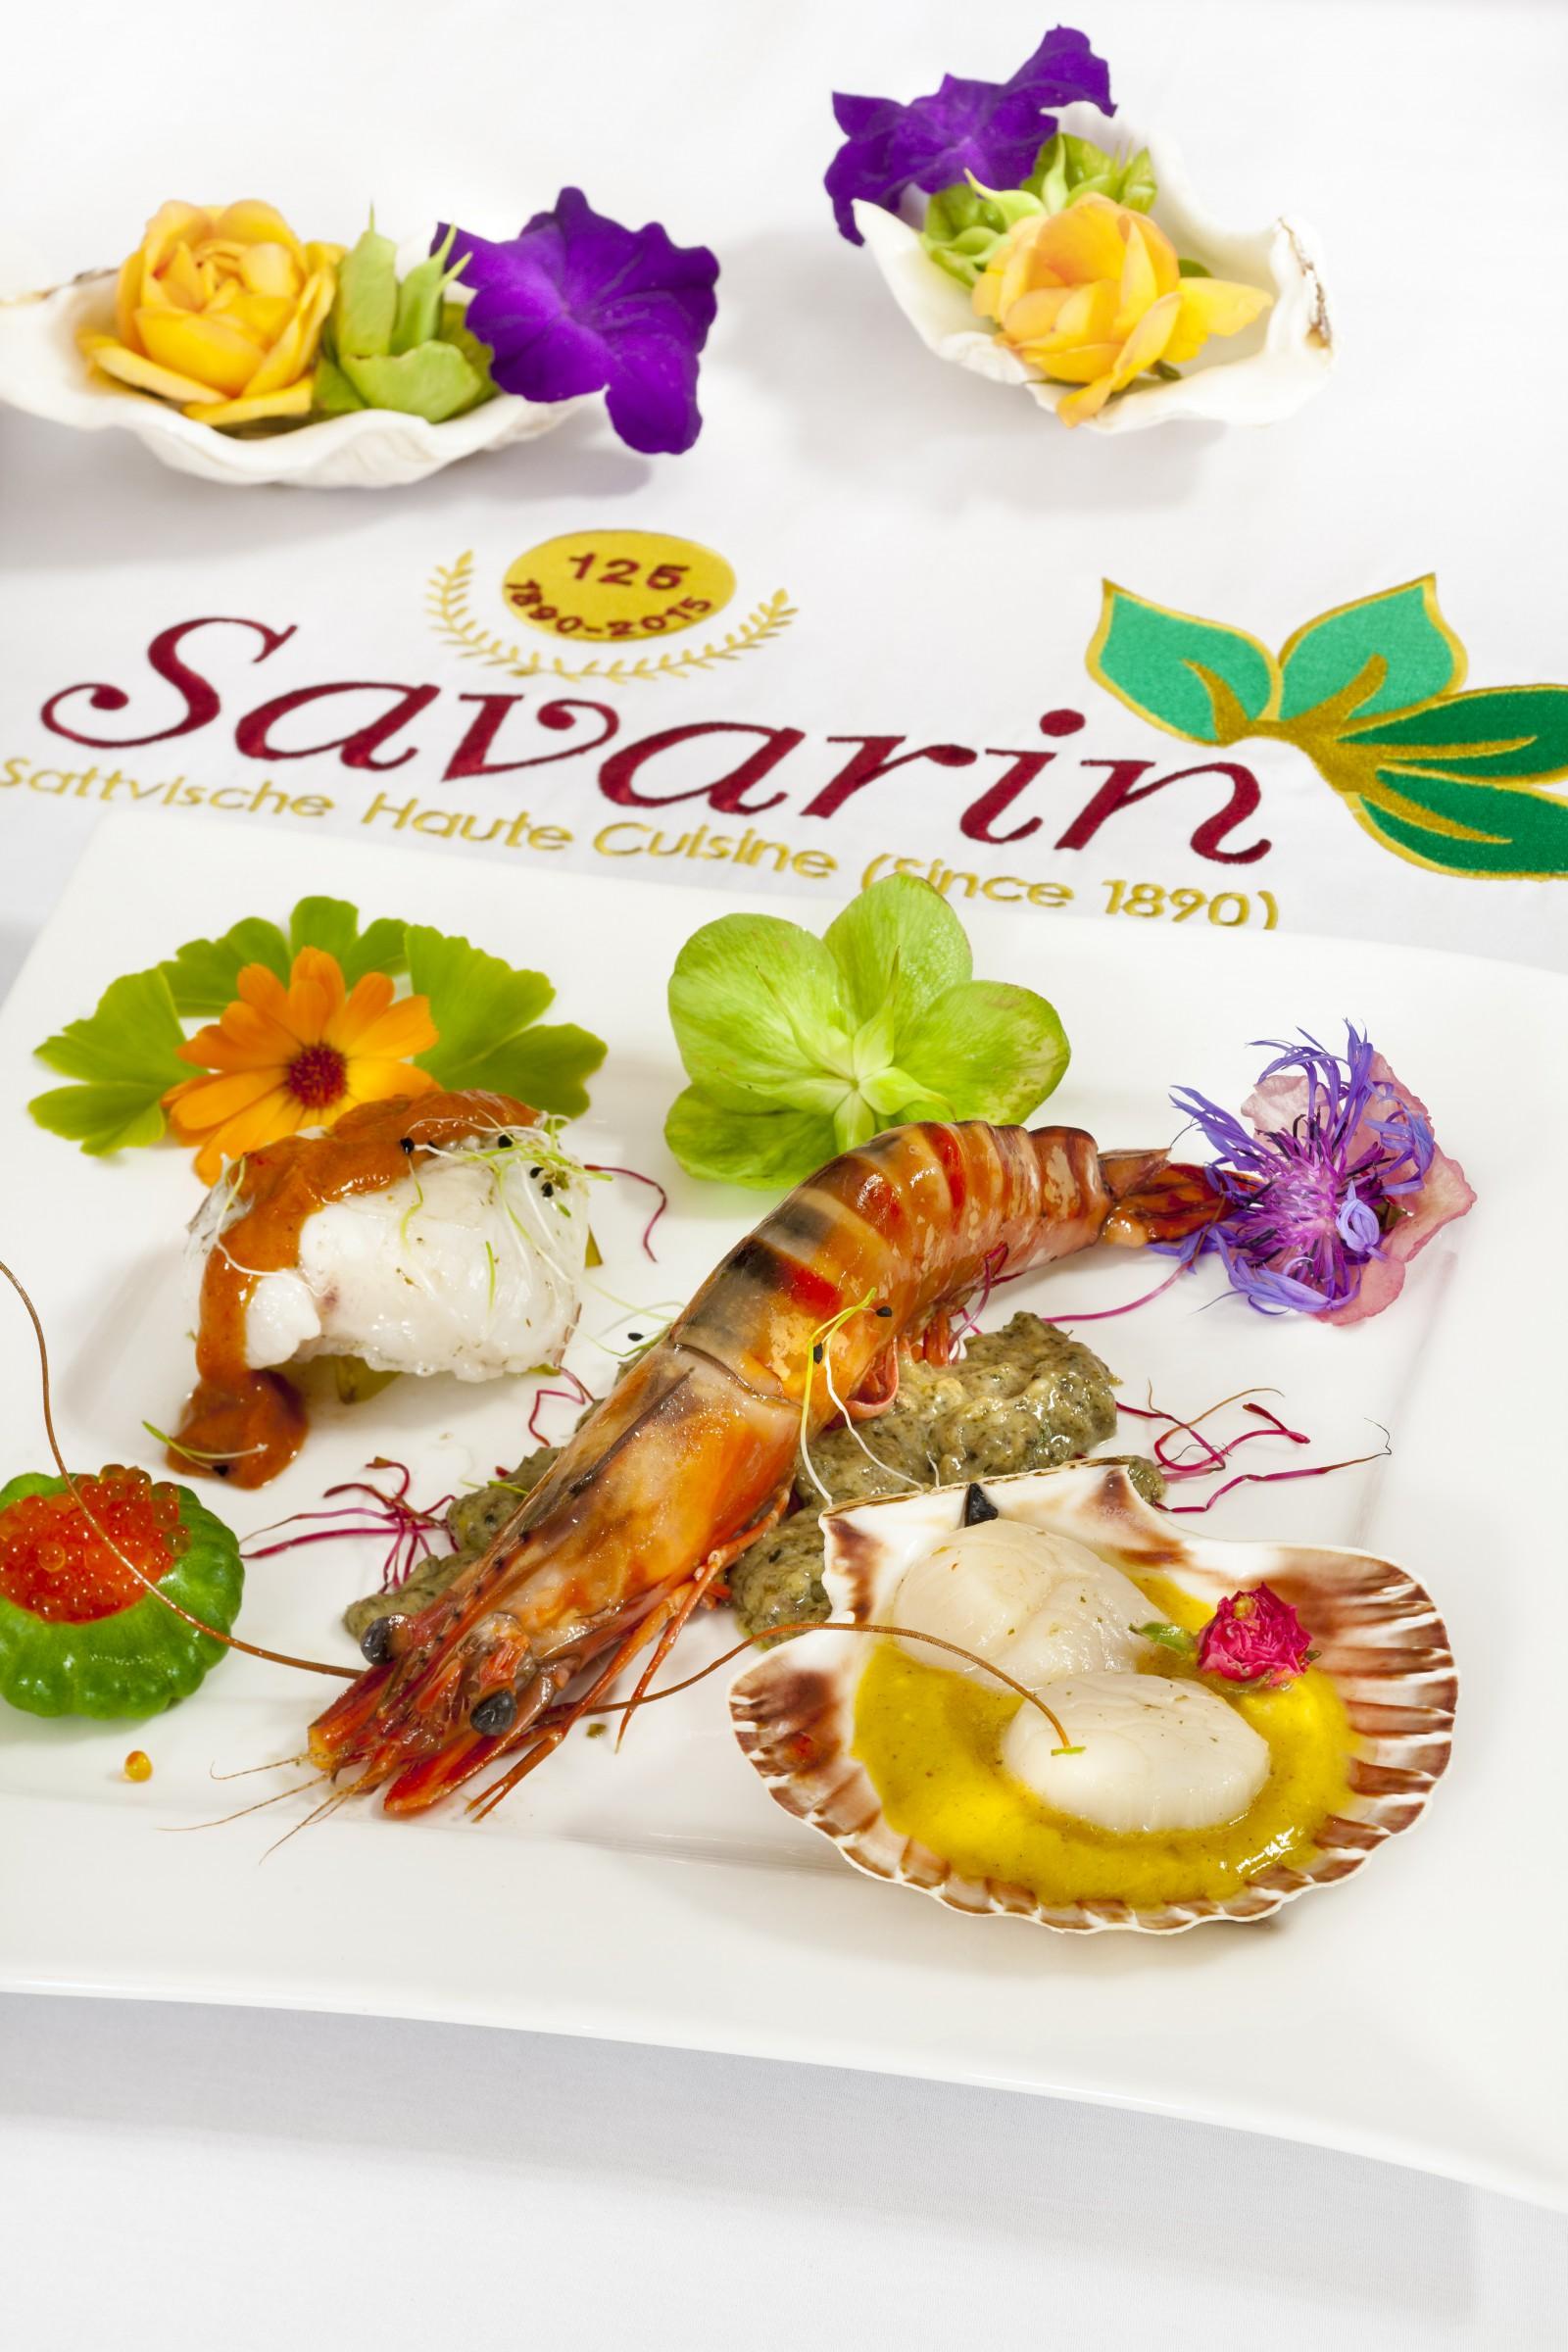 Restaurant Savarin Sattvische Haute Cuisine in Bad Dürkheim